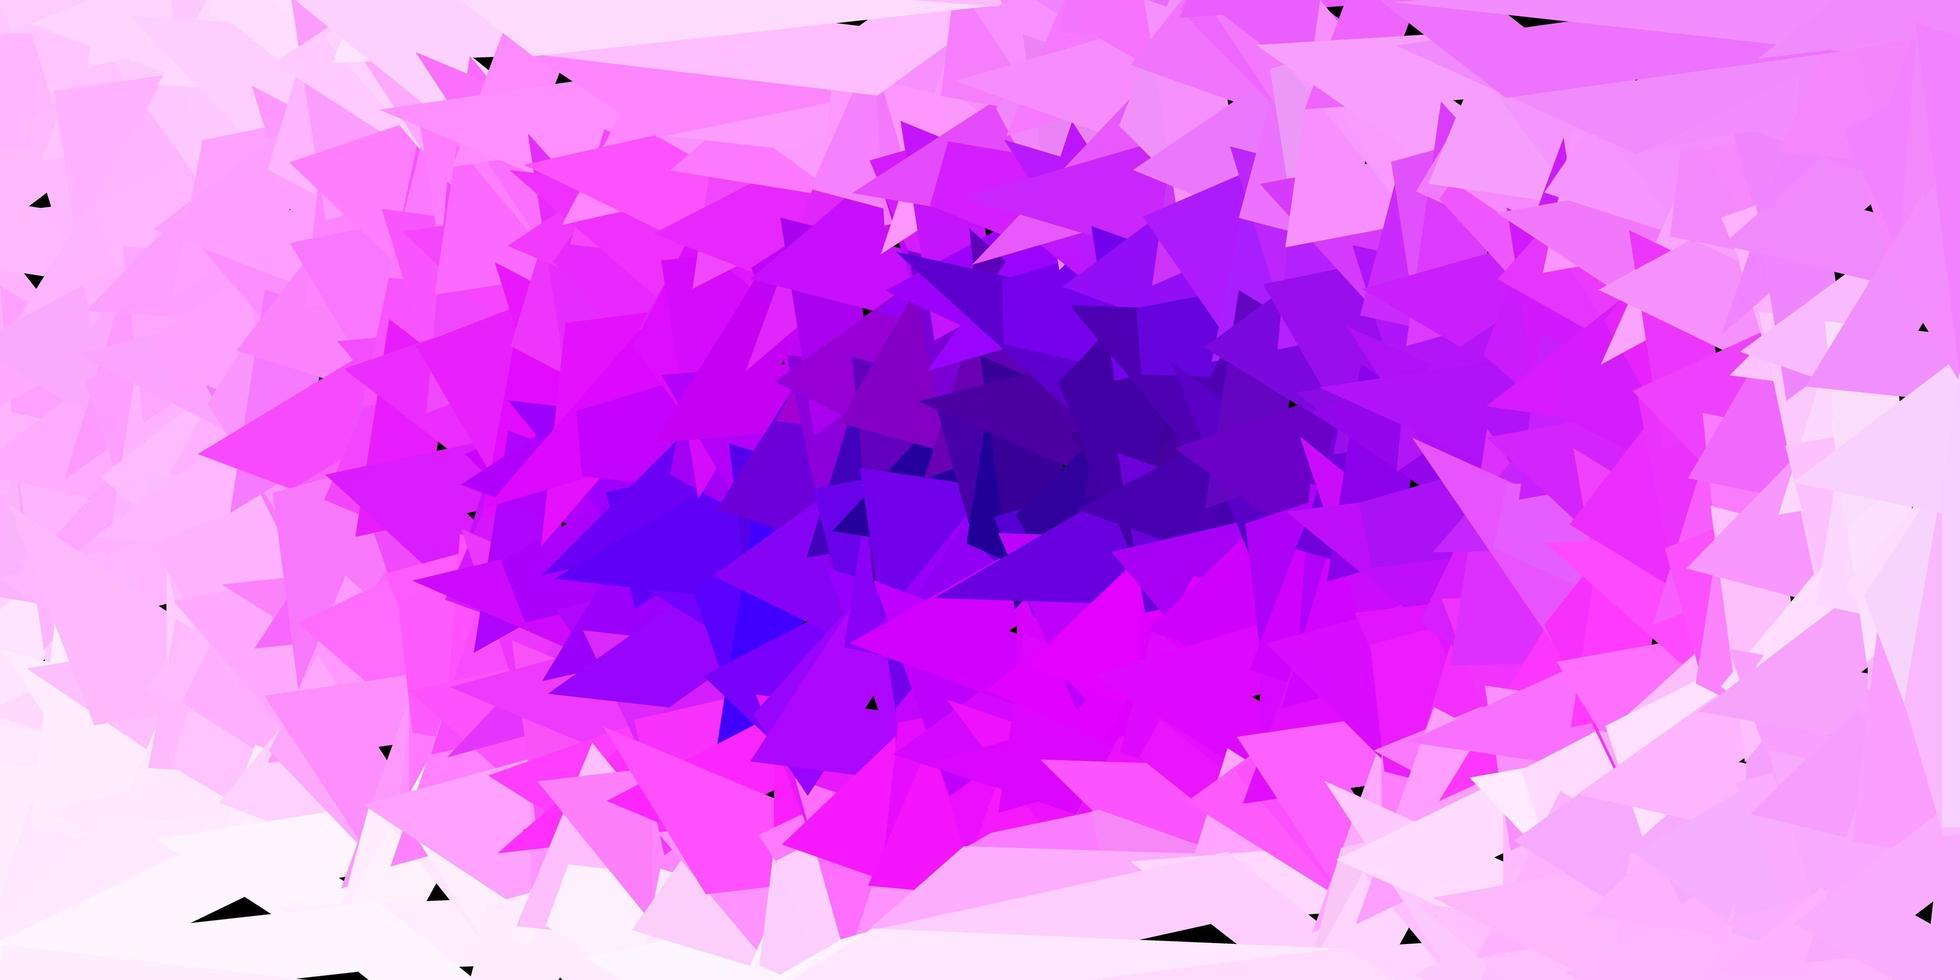 ljus lila, rosa vektor gradient polygon layout.